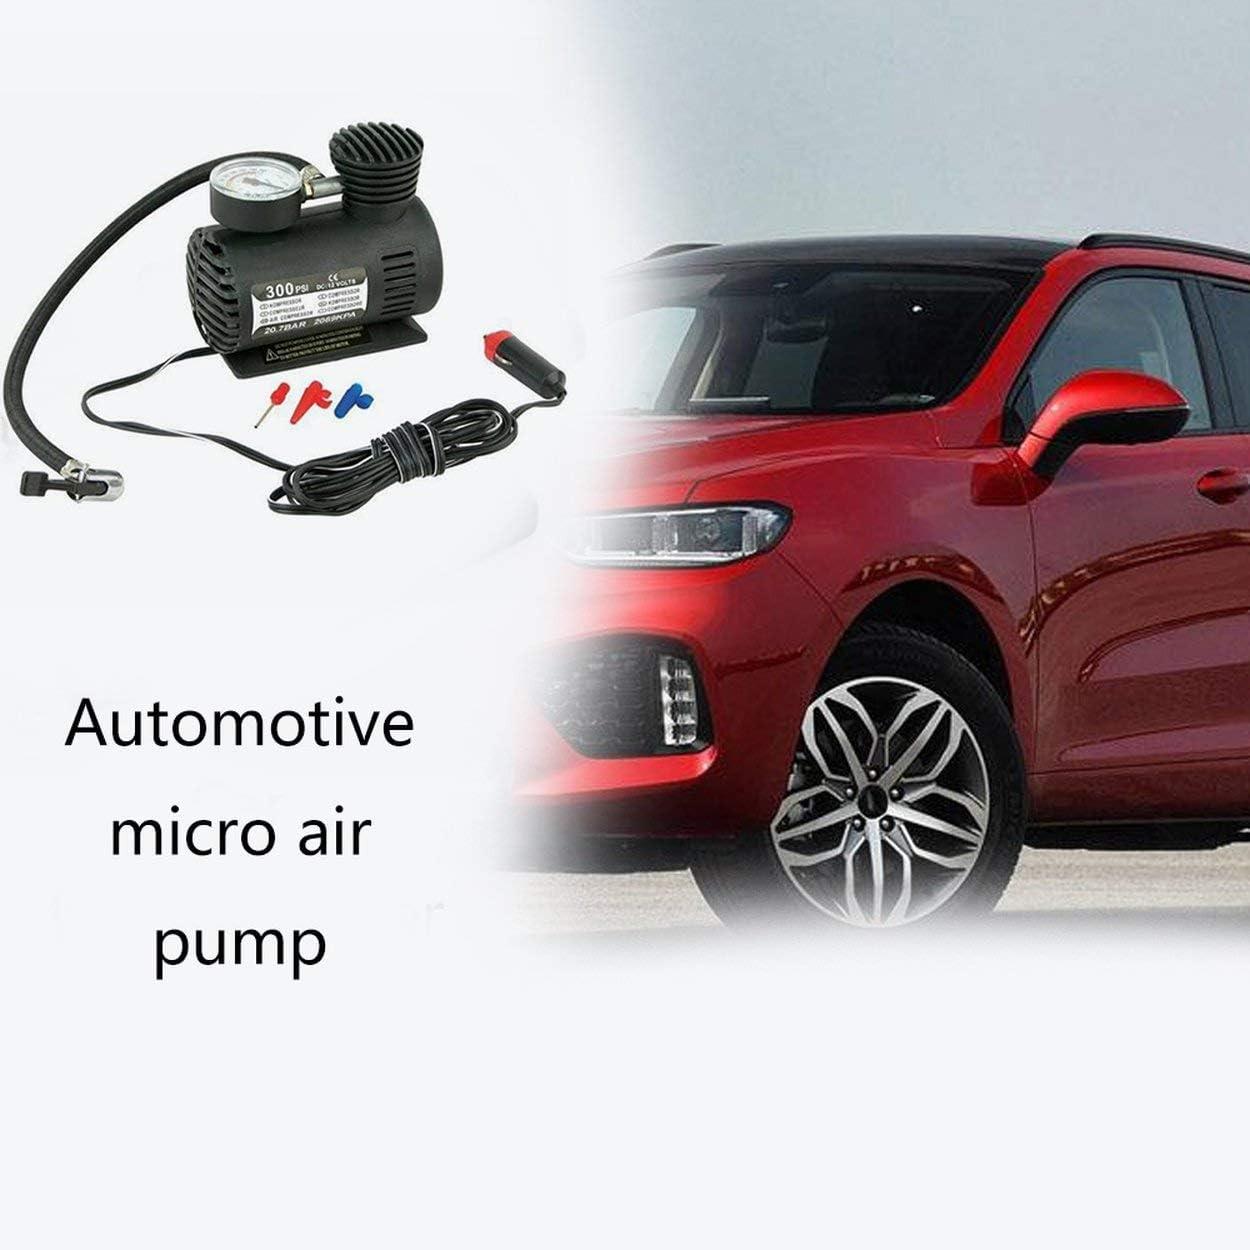 Lorenlli Black Portable Versatile 12V 300PSI Car Tire Tyre Inflator Pump Mini Compact Compressor Pump Car Bike Tyre Air Inflator